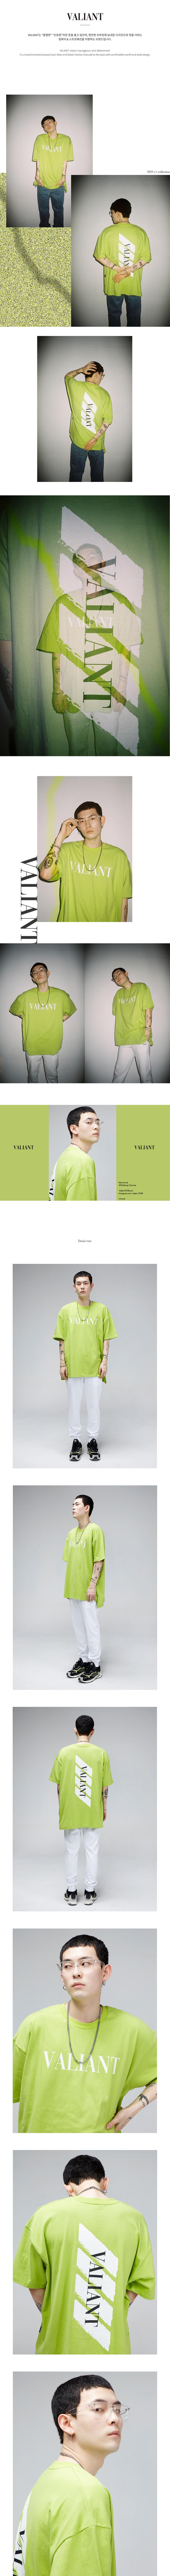 colorbrick_green.jpg